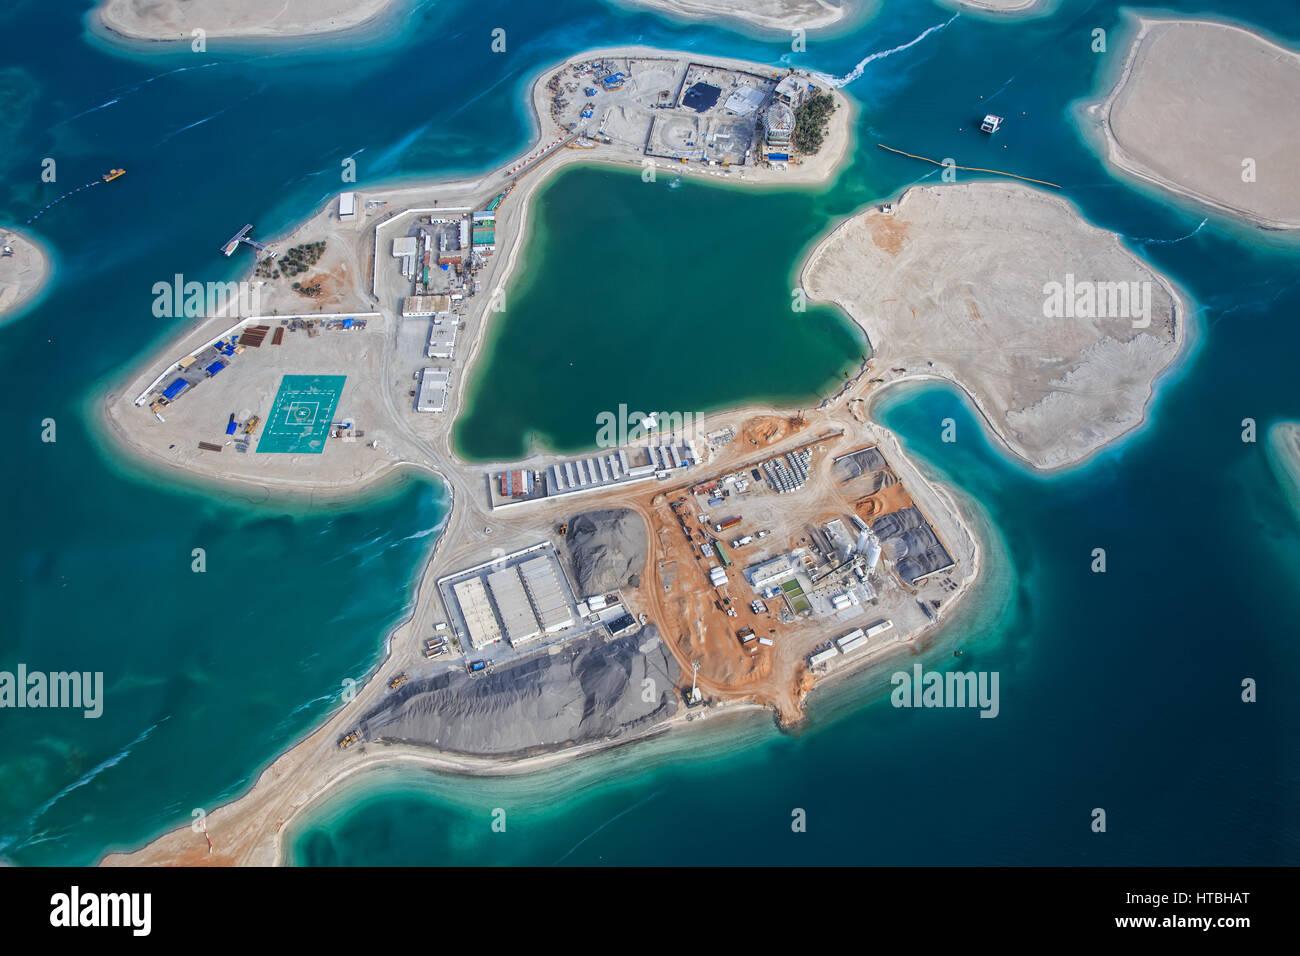 Dubaiuae march 9 2017 the world islands stock photo 135479424 dubaiuae march 9 2017 the world islands gumiabroncs Gallery